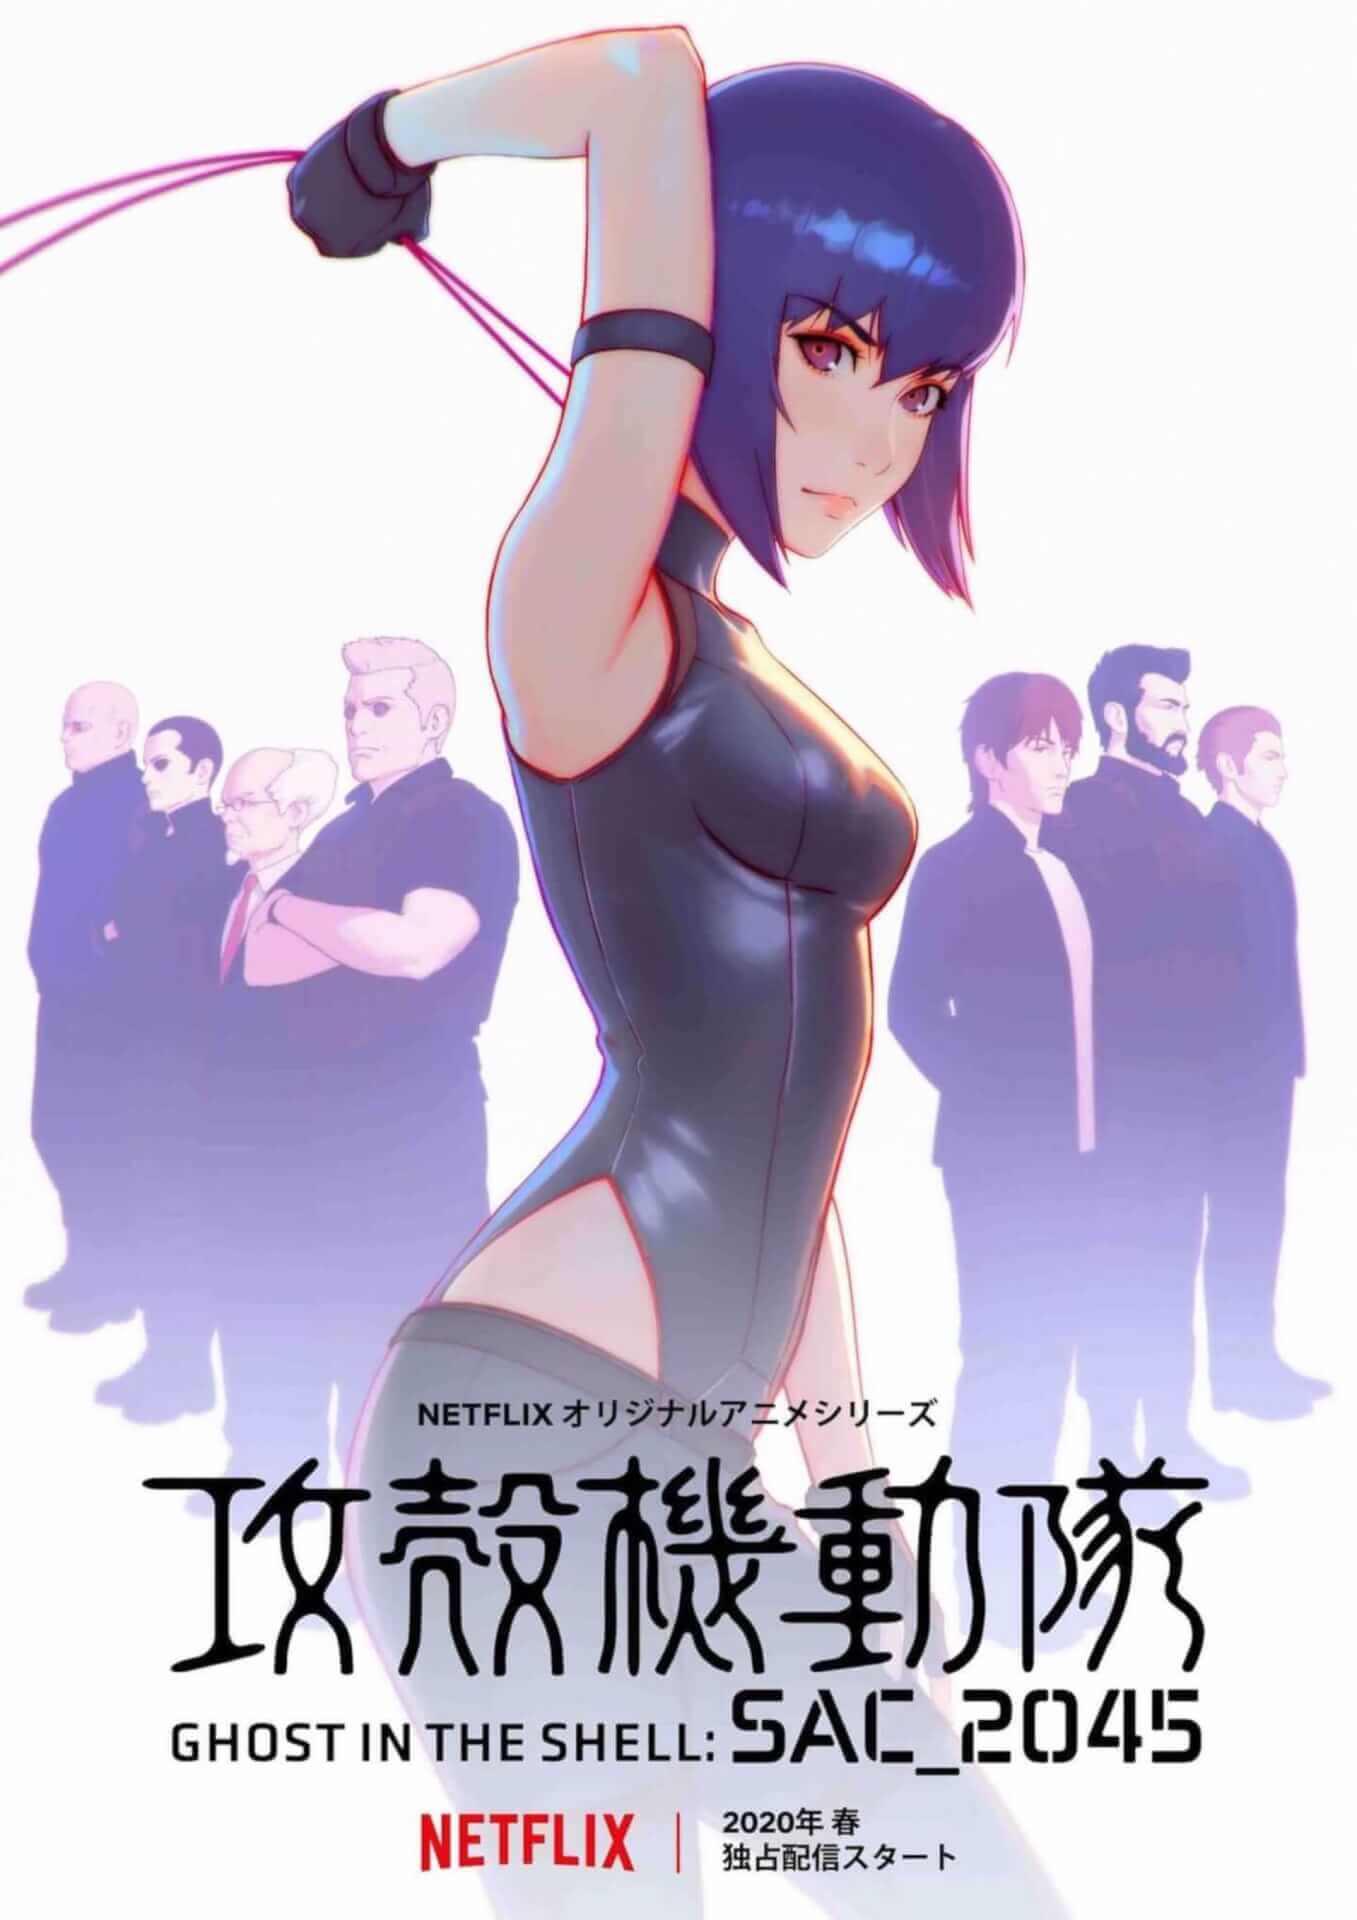 Netflix『攻殻機動隊 SAC_2045』シーズン2制作が決定!草薙素子が躍動するシーズン1の本編映像も解禁 art200420_ghostintheshell_3